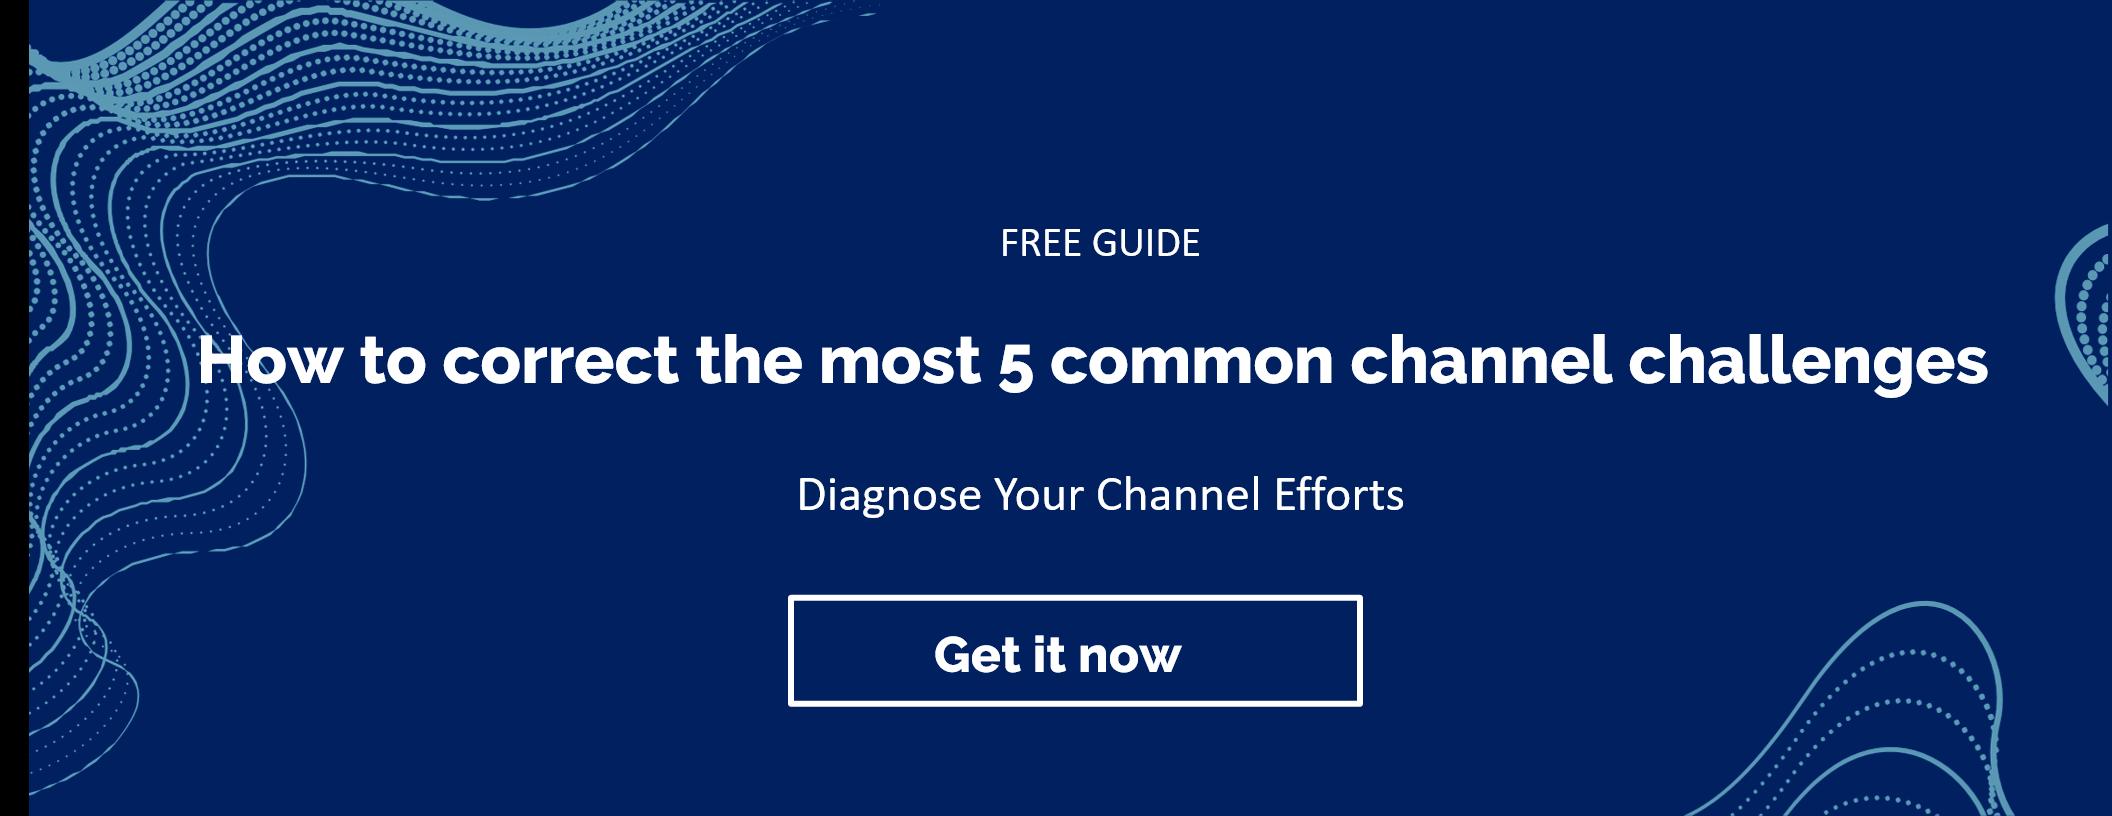 diagnose channel efforts_cta